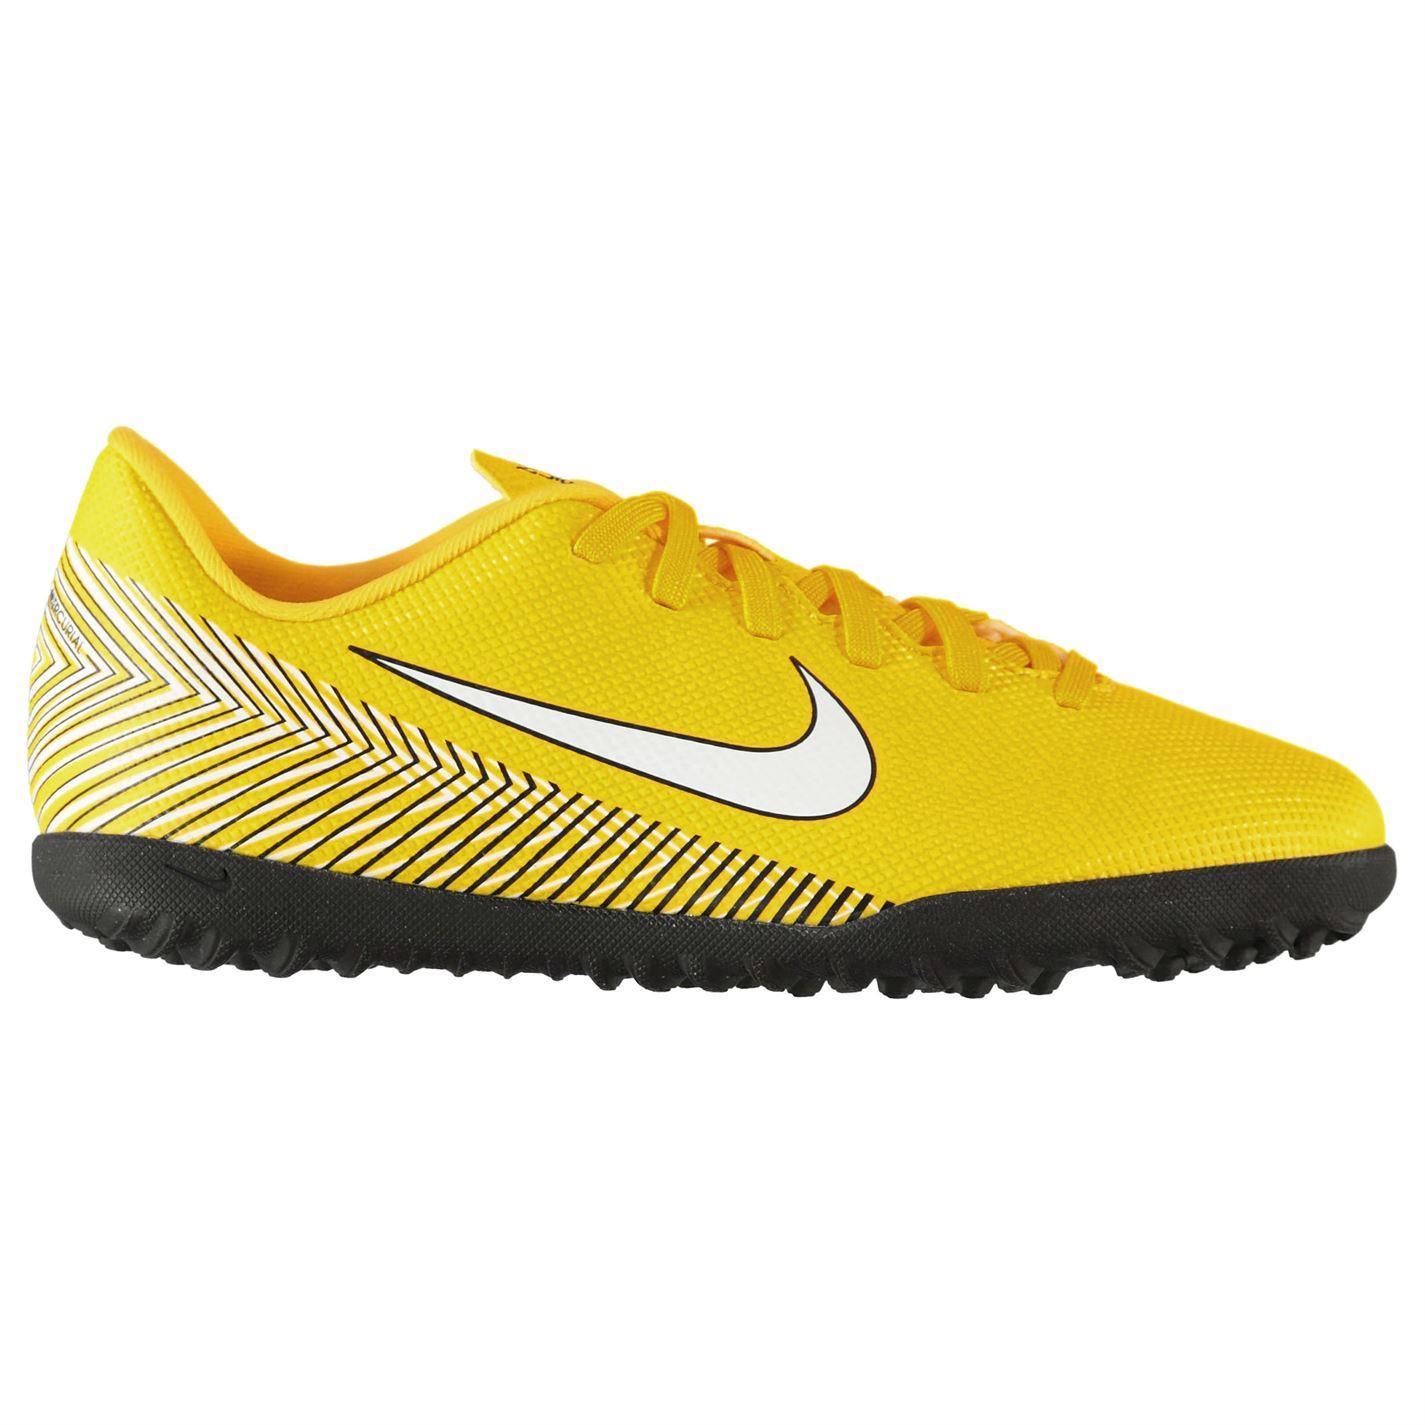 boty Nike Mercurial Vapor Club Neymar Jr dětské Astro Turf